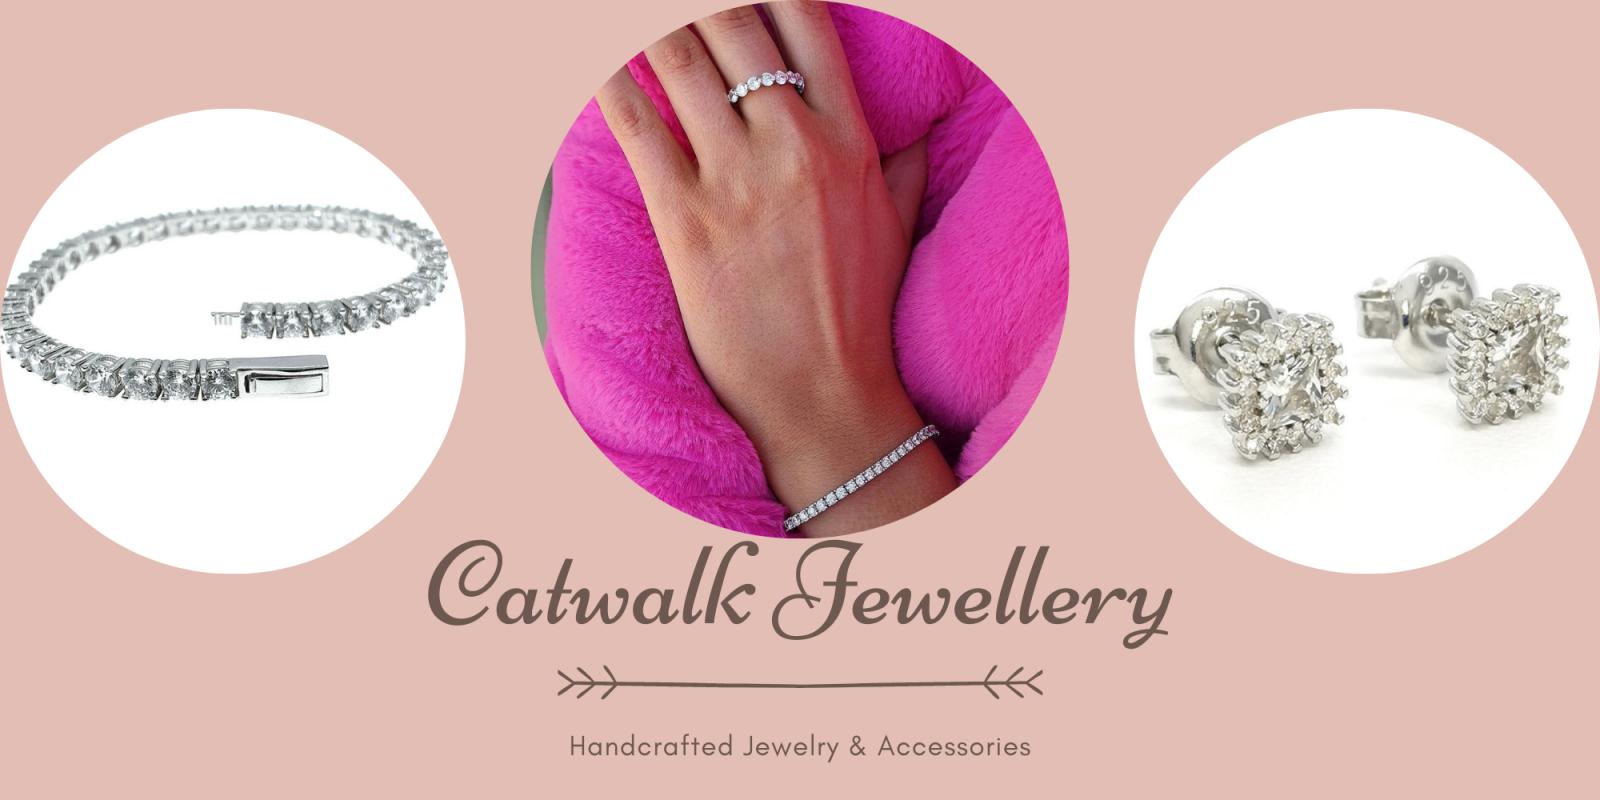 Catwalk Jewellery